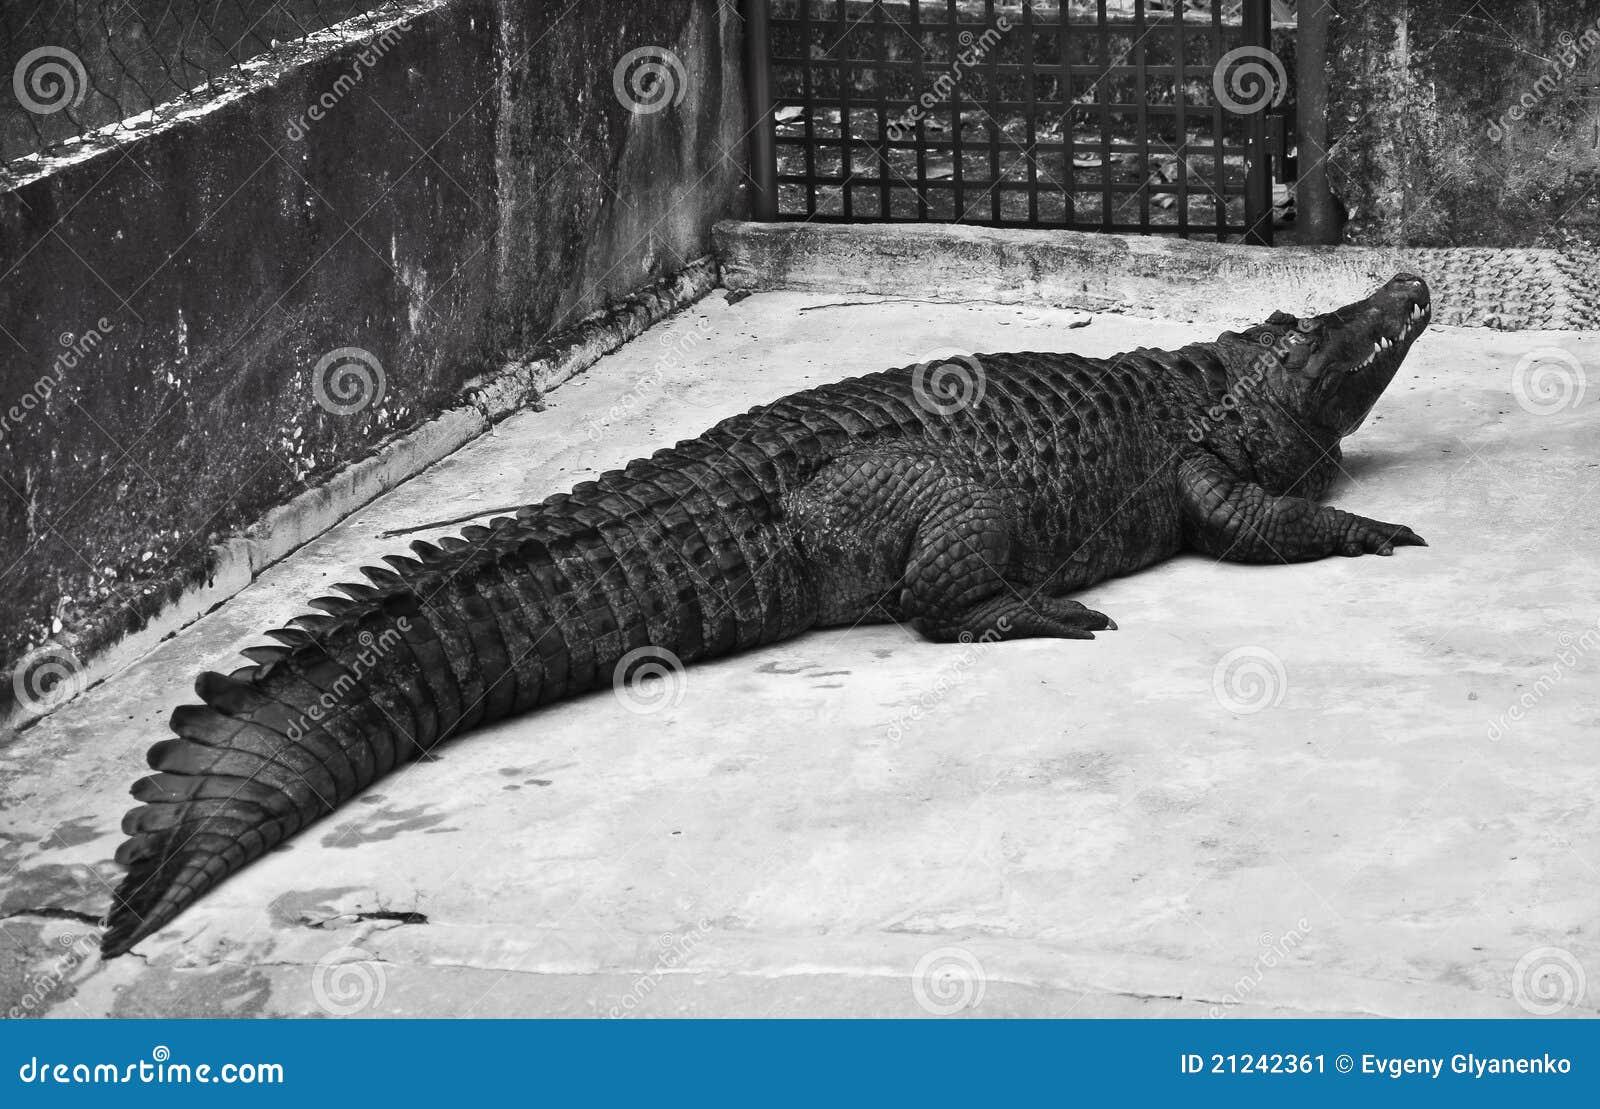 2441021849 furthermore Tempat Menarik Di Selangor together with Foldify Zoo Ipad Bouwplaten Dieren Inkleuren Knutselen besides Rappy Reminisces On Zoo Tycoon 2 likewise Mixed Cool Desktop Wallpapers Free. on 3d zoo animals